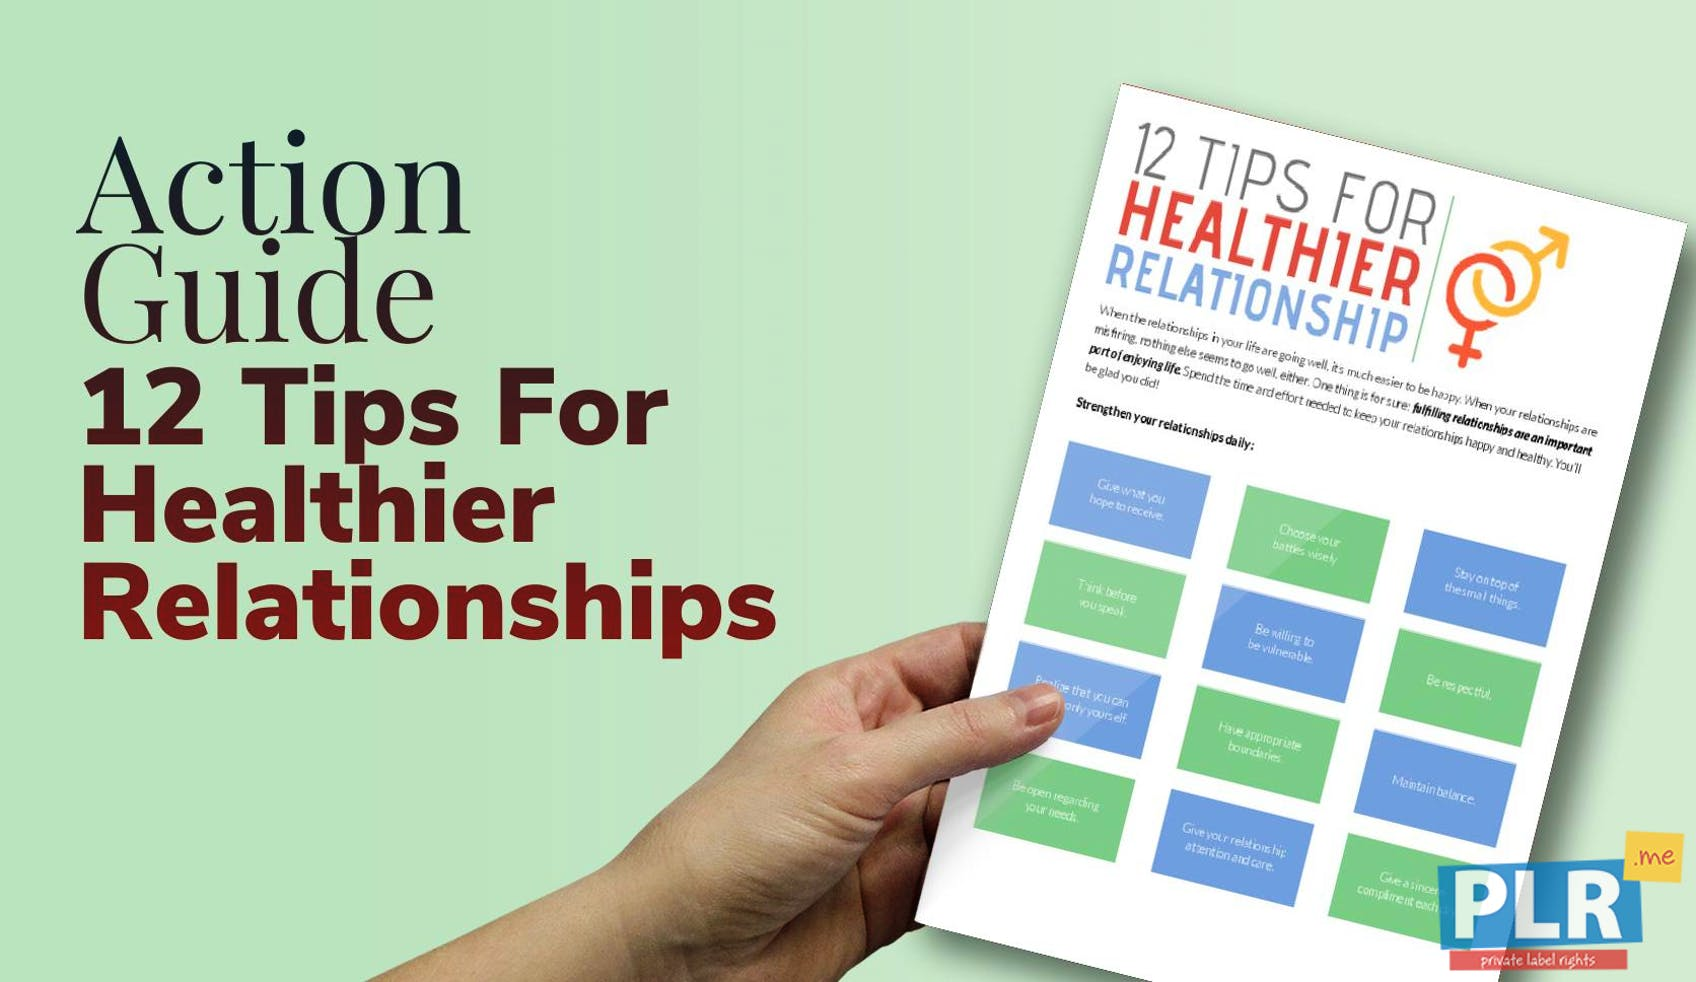 12 Tips For Healthier Relationships